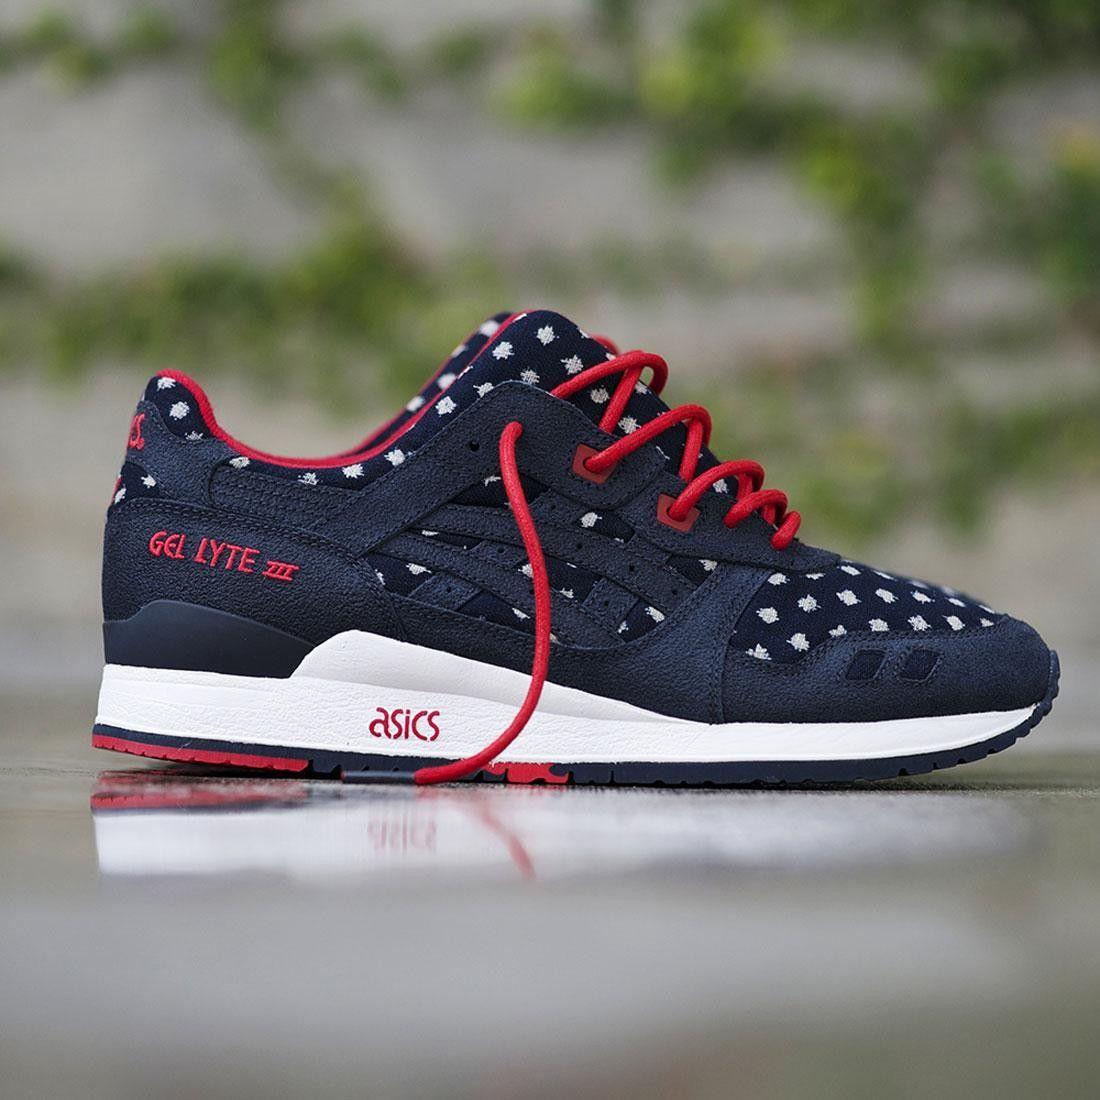 bait chaussures